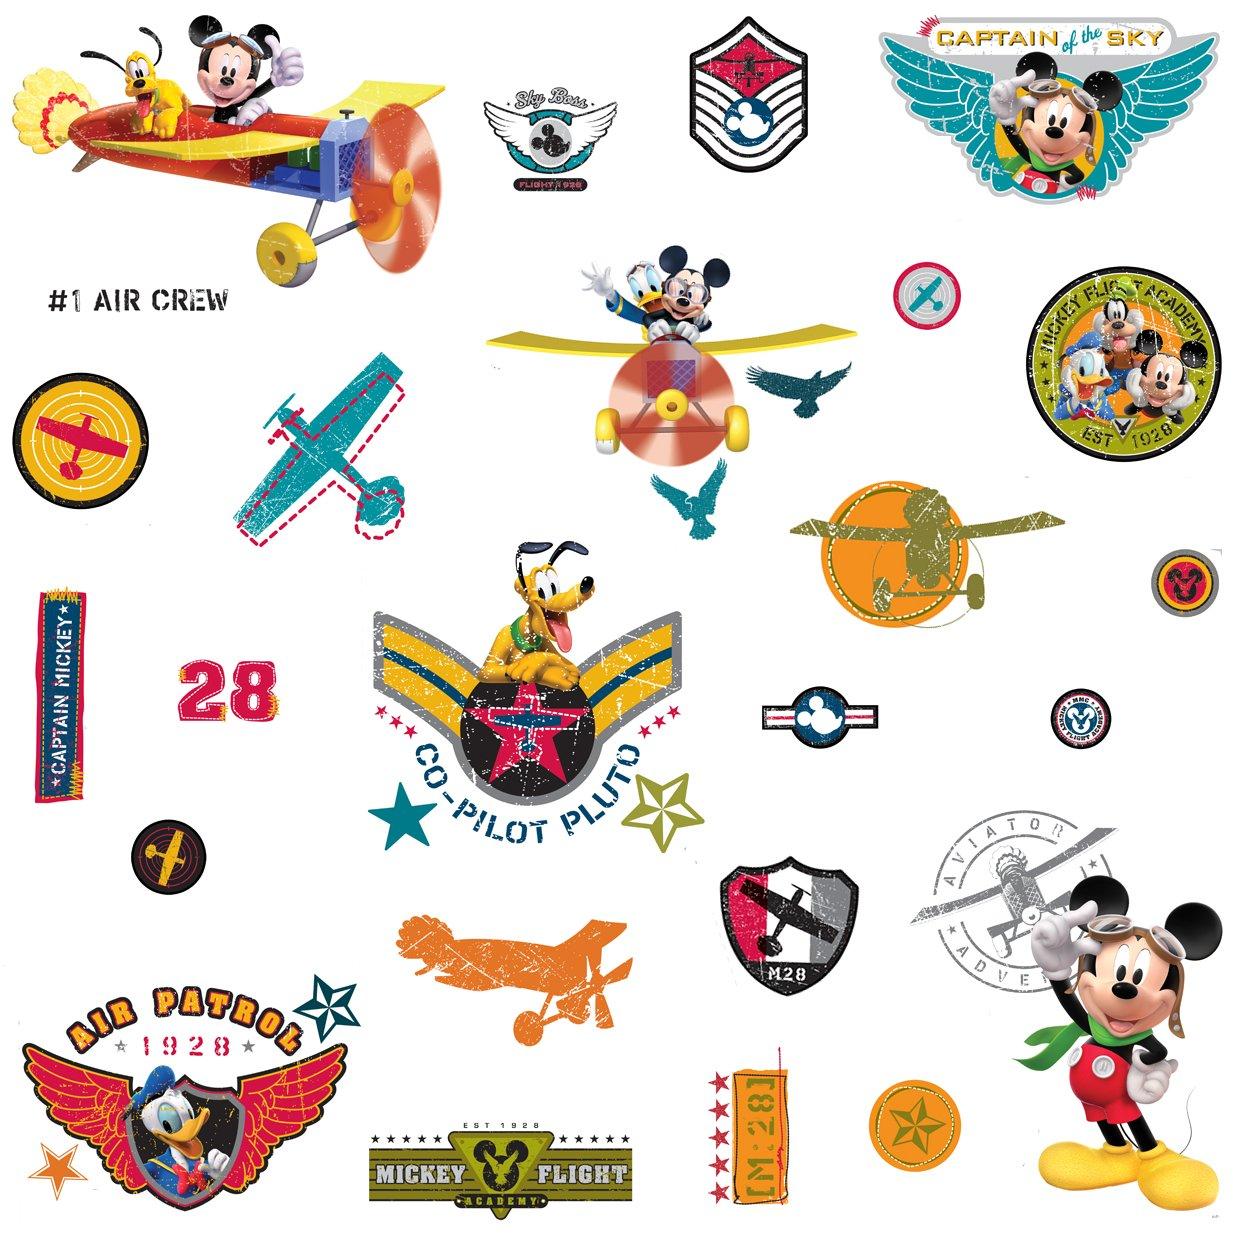 Roommates Rmk1674Scs Mickey U0026 Friends   Clubhouse Pilot Peel U0026 Stick Wall  Decals   Decorative Wall Appliques   Amazon.com